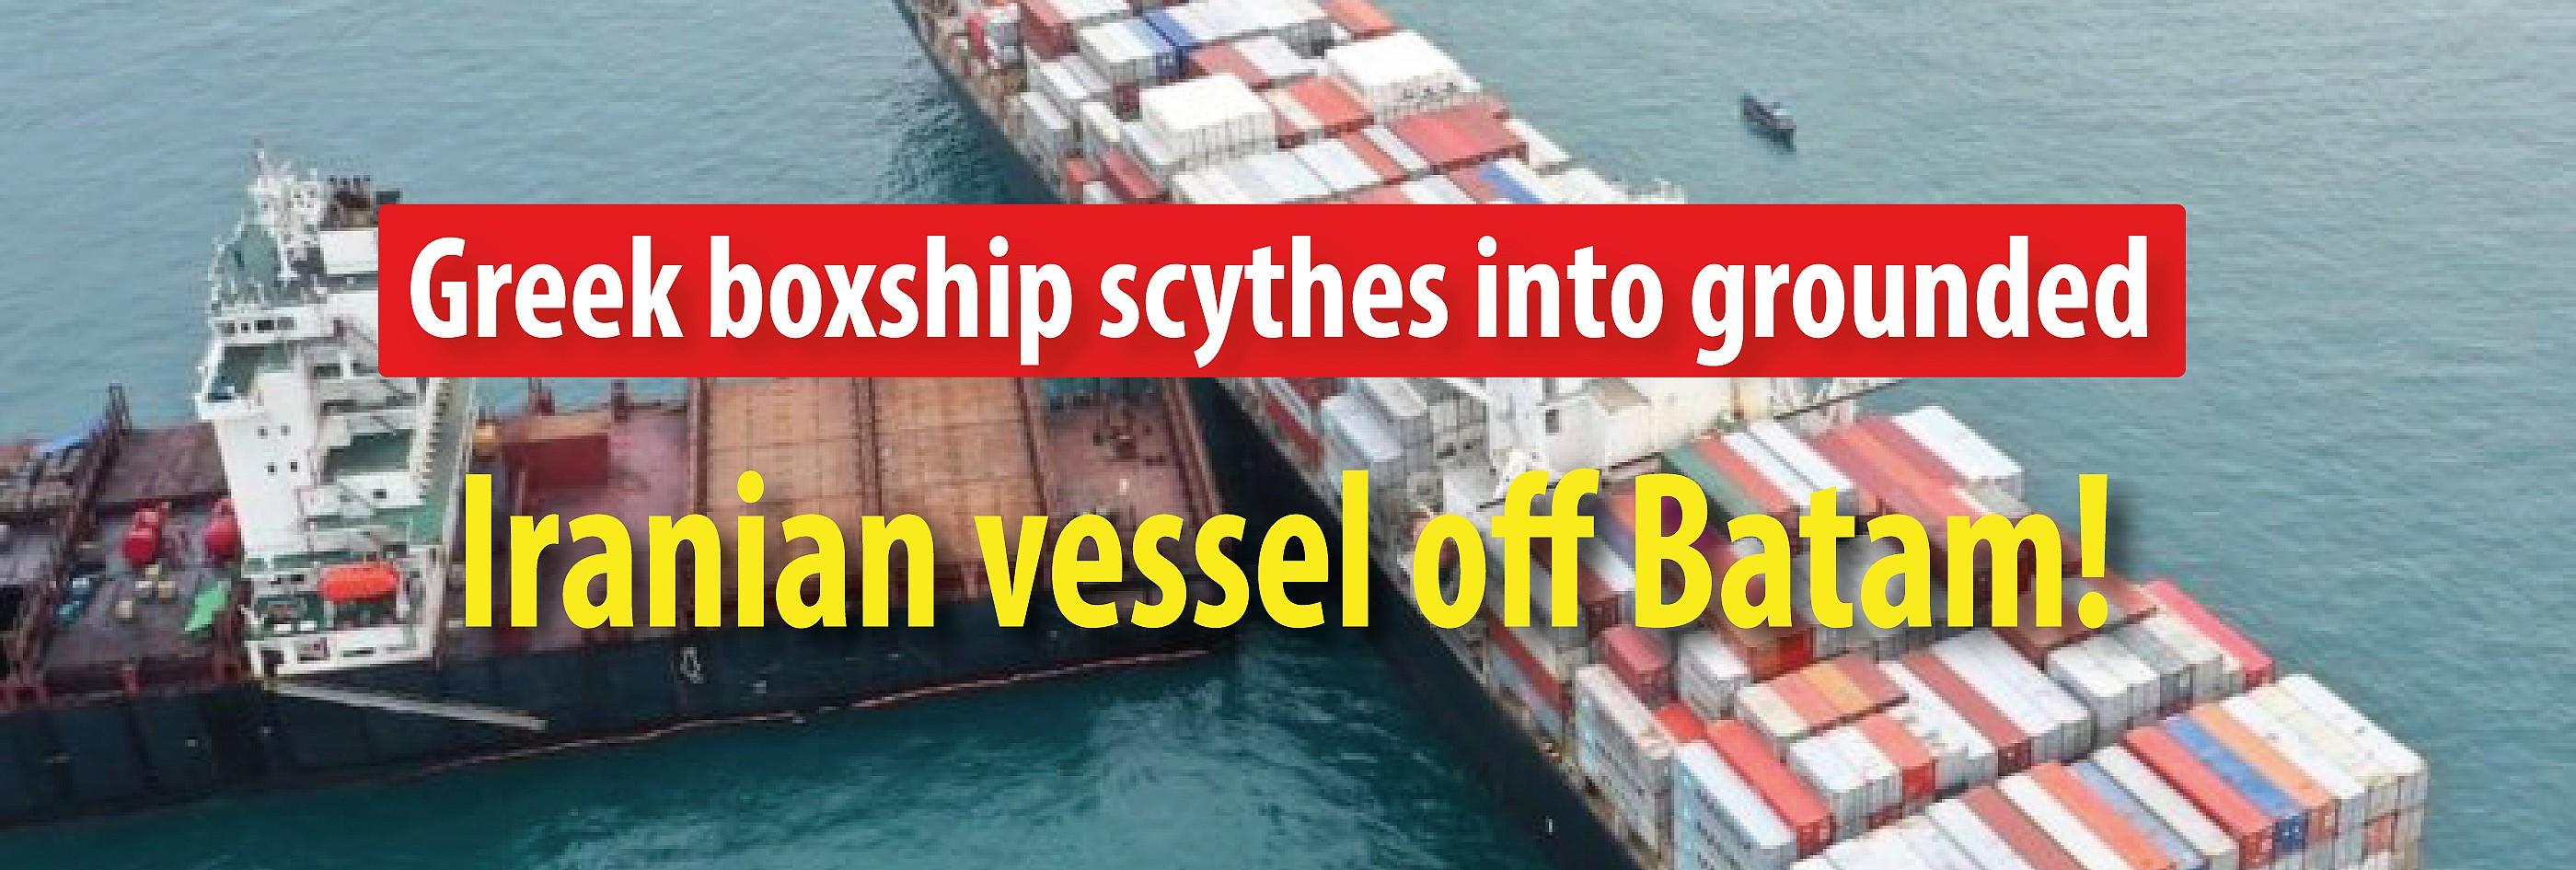 Greek boxship scythes into grounded Iranian vessel off Batam!